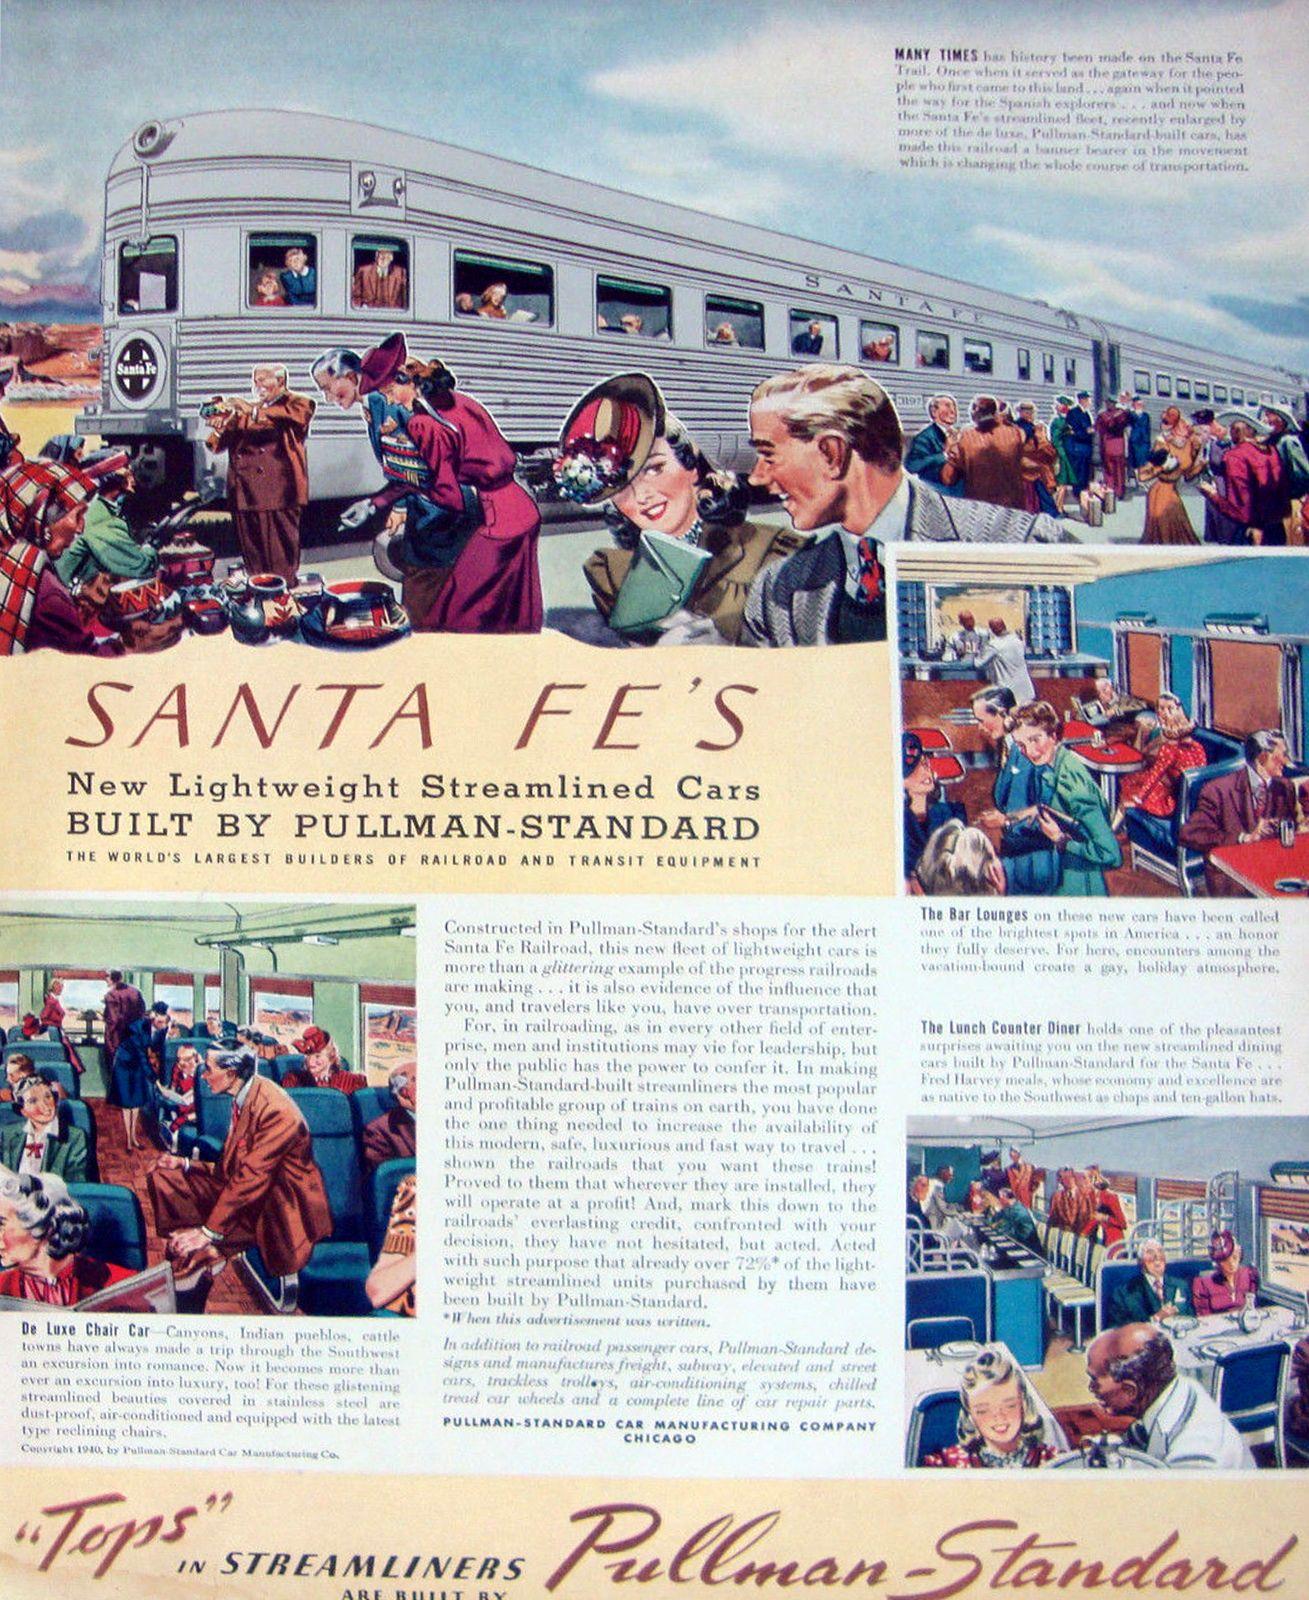 1940 Pullman Standard Railroad Ad Santa Fe Streamliners. https://www.google.co.uk/search?q=1940+Pullman+Standard+Railroad+Ad+Santa+Fe+Streamliners&biw=1366&bih=622&source=lnms&tbm=isch&sa=X&ei=4pn7VL2ONof9ywPVm4H4Cg&ved=0CAYQ_AUoAQ